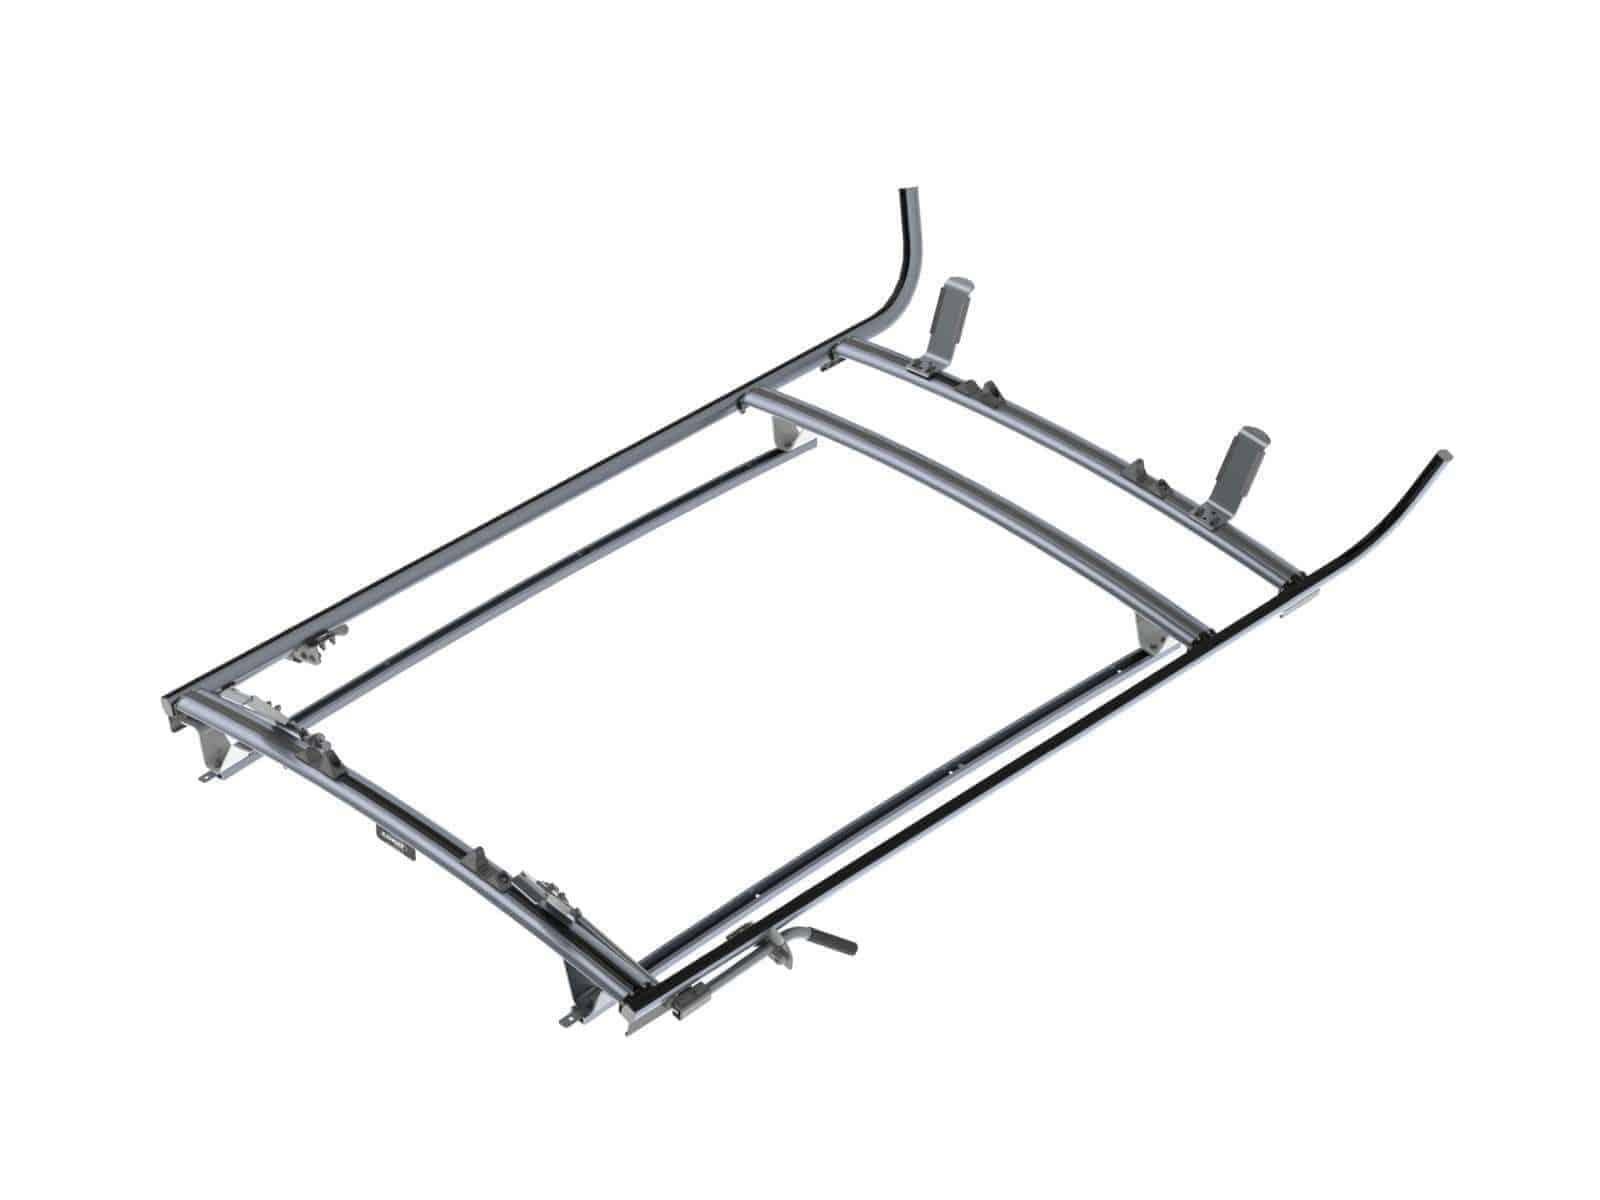 Double Clamp Ladder Rack Aluminum 3 Bar Nissan Nv200